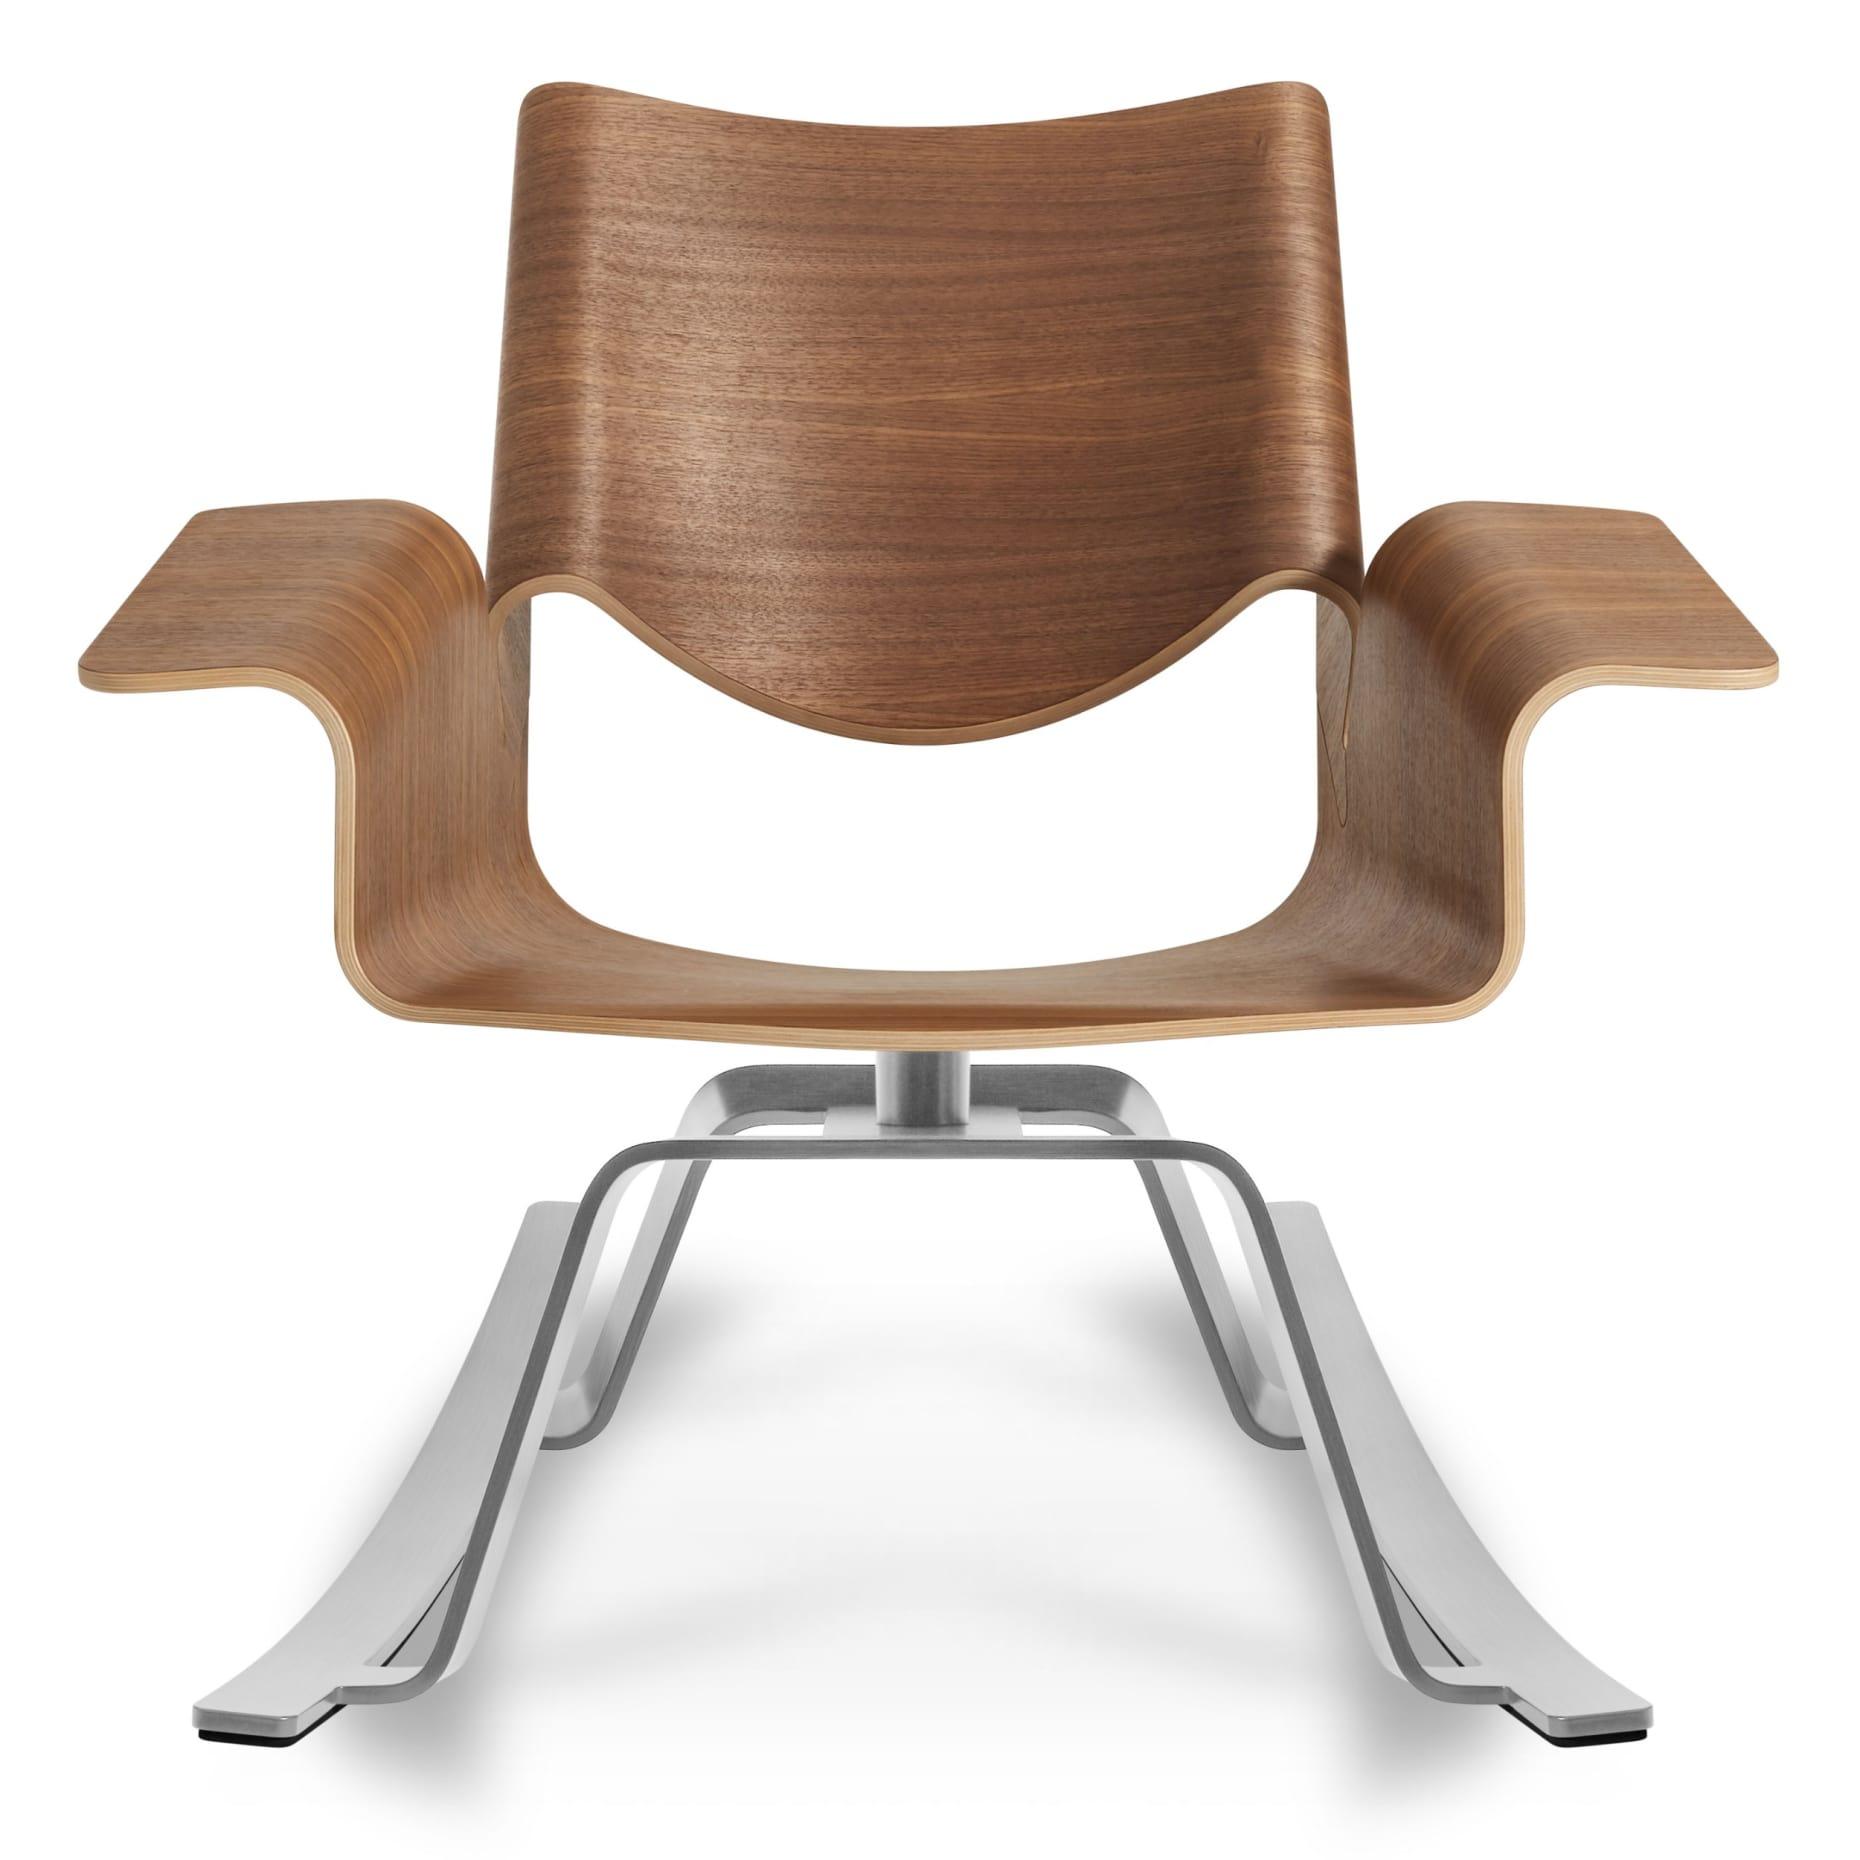 Buttercup Rocker Regarding Dark Walnut Brown Wooden Rocking Chairs (#4 of 20)